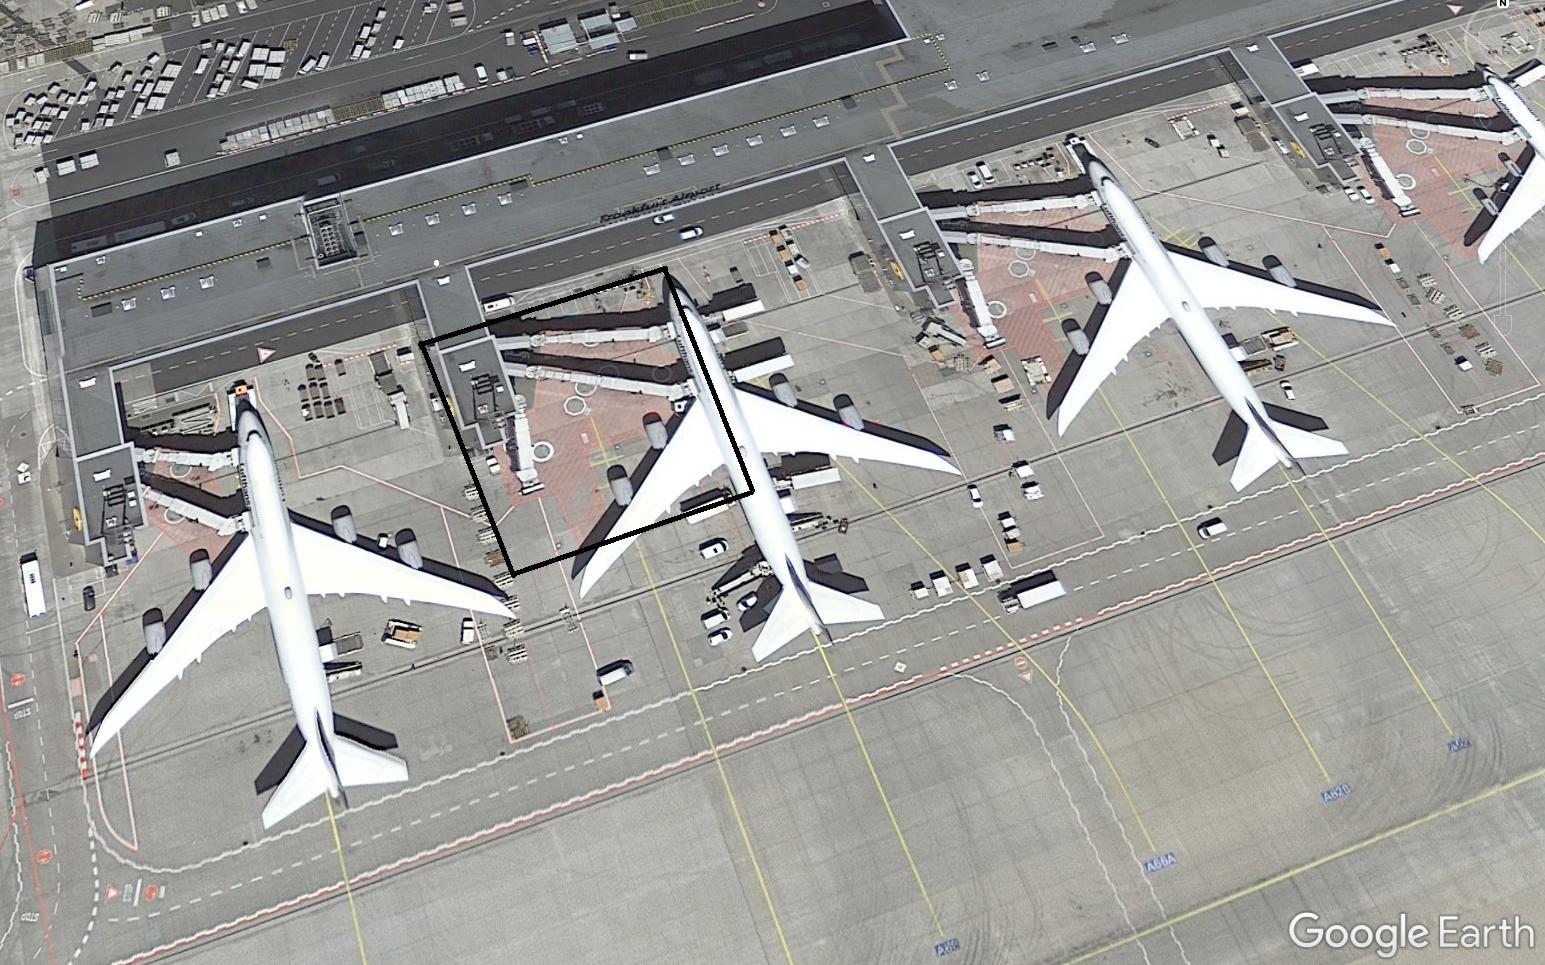 Mega Airport EDDF V1 0 Xplane 11 - Scenery General - AEROSOFT